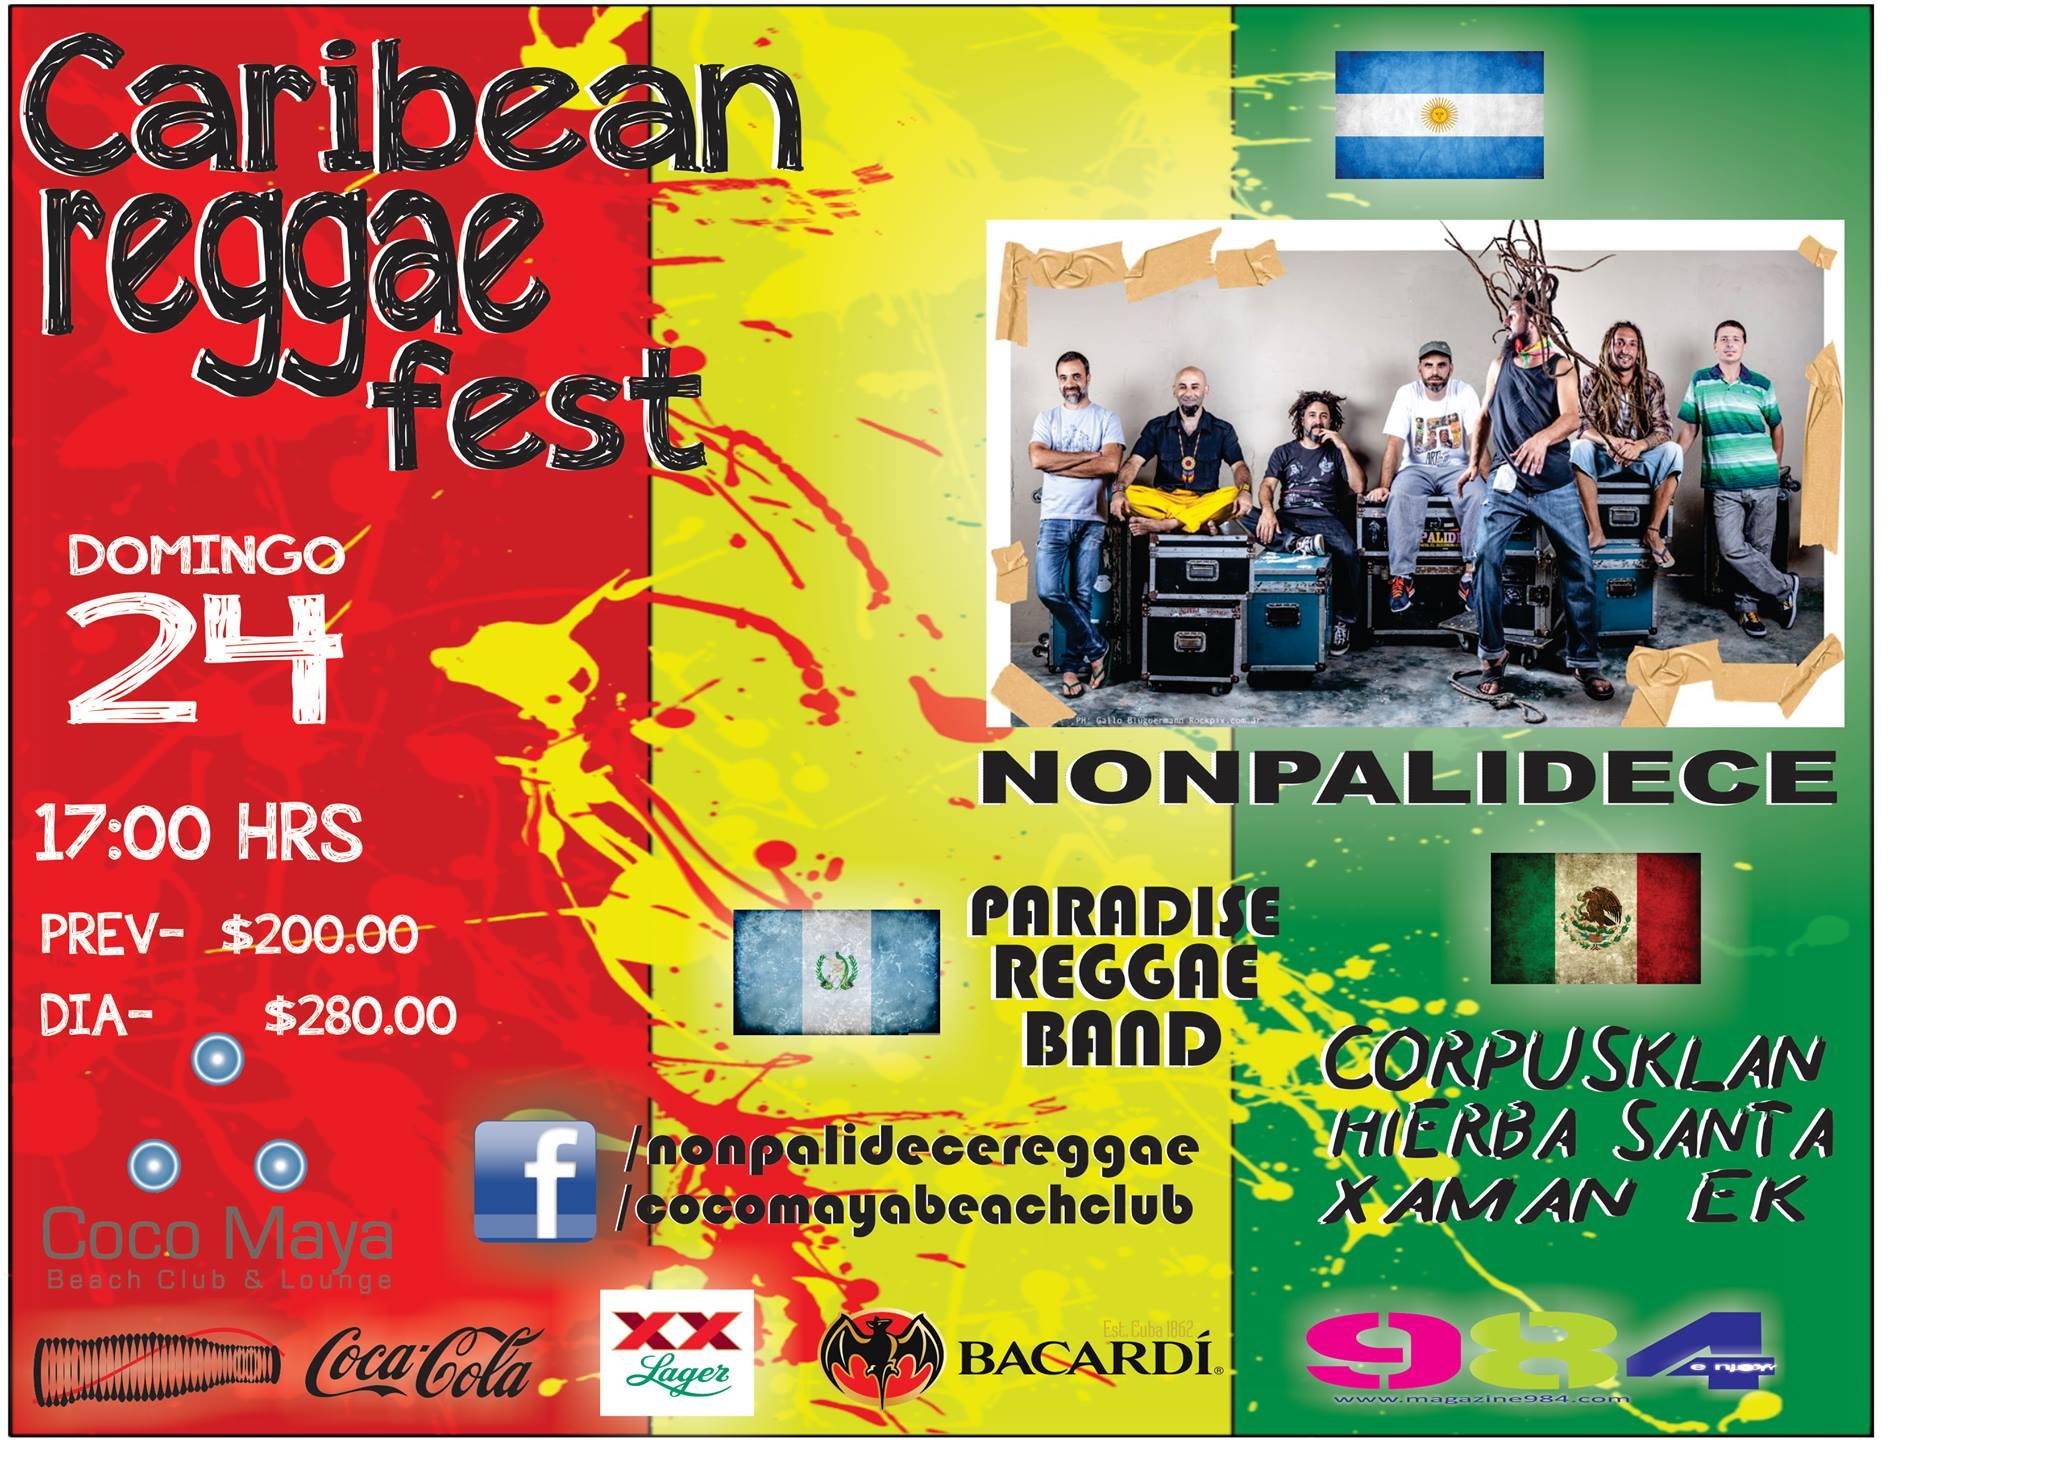 Caribbean Reggae Fest 2013 @ Coco Maya